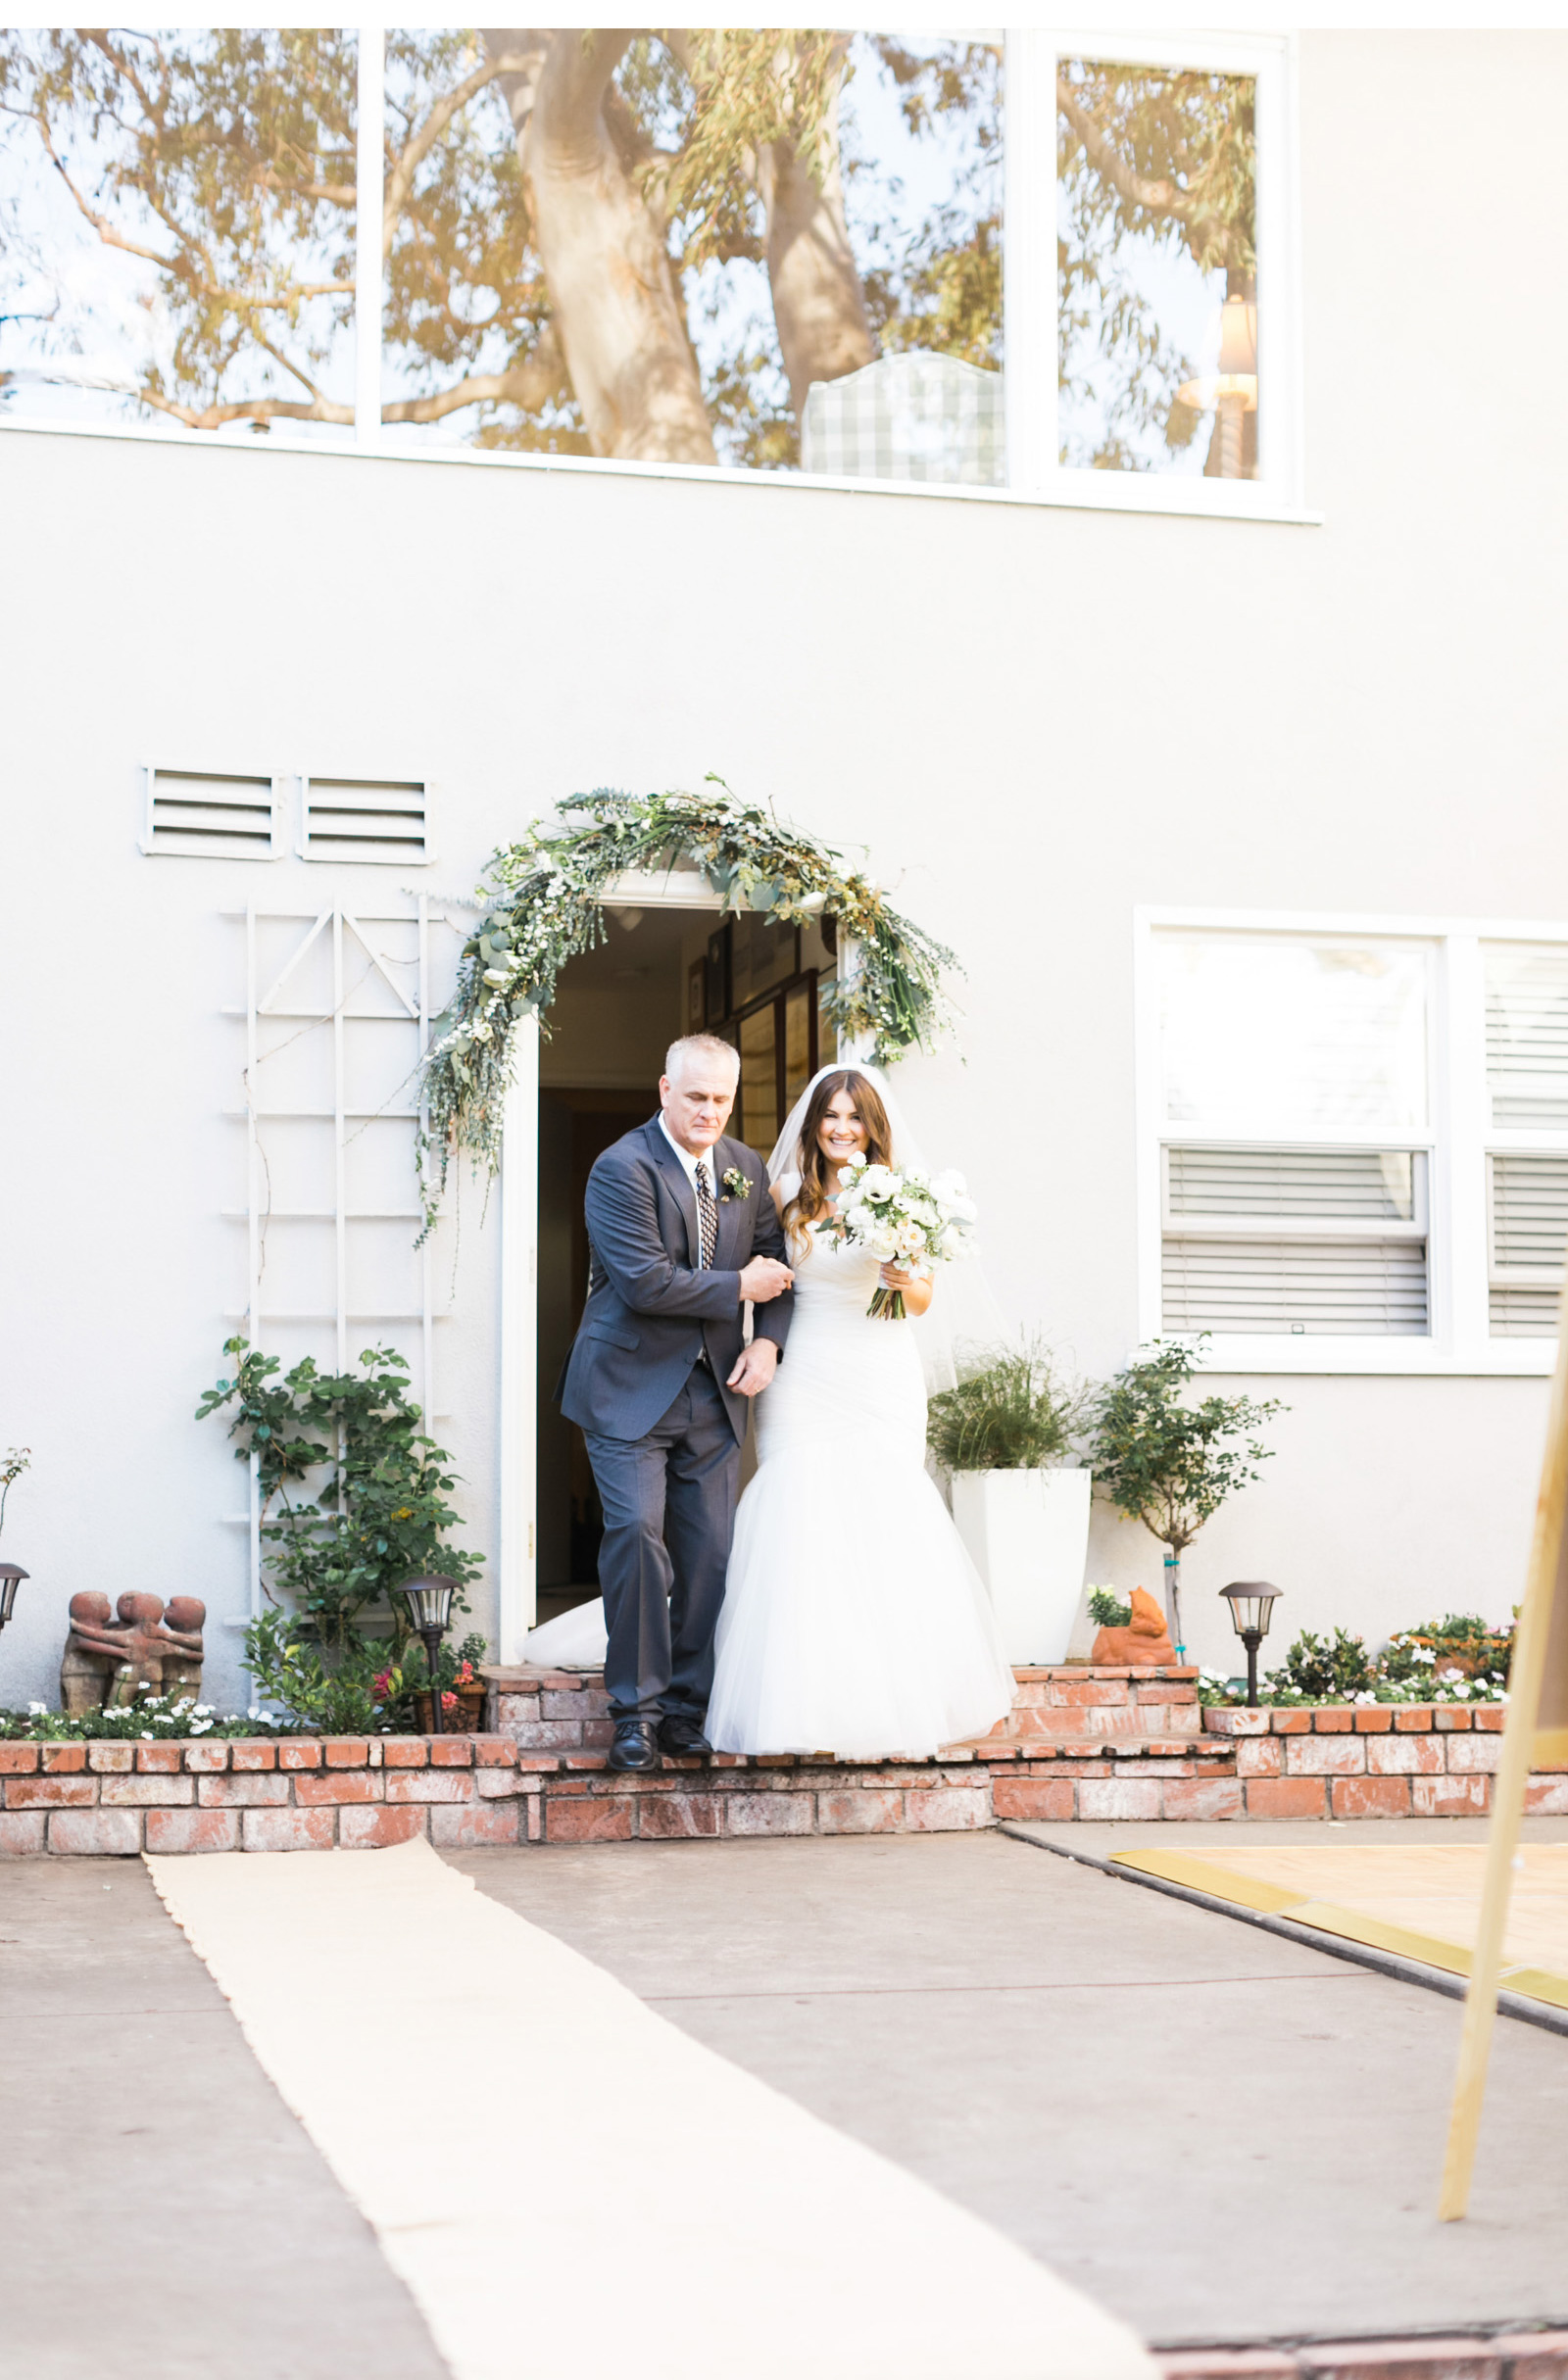 Style-Me-Pretty-Backyard-Wedding-Natalie-Schutt-Photography_01.jpg